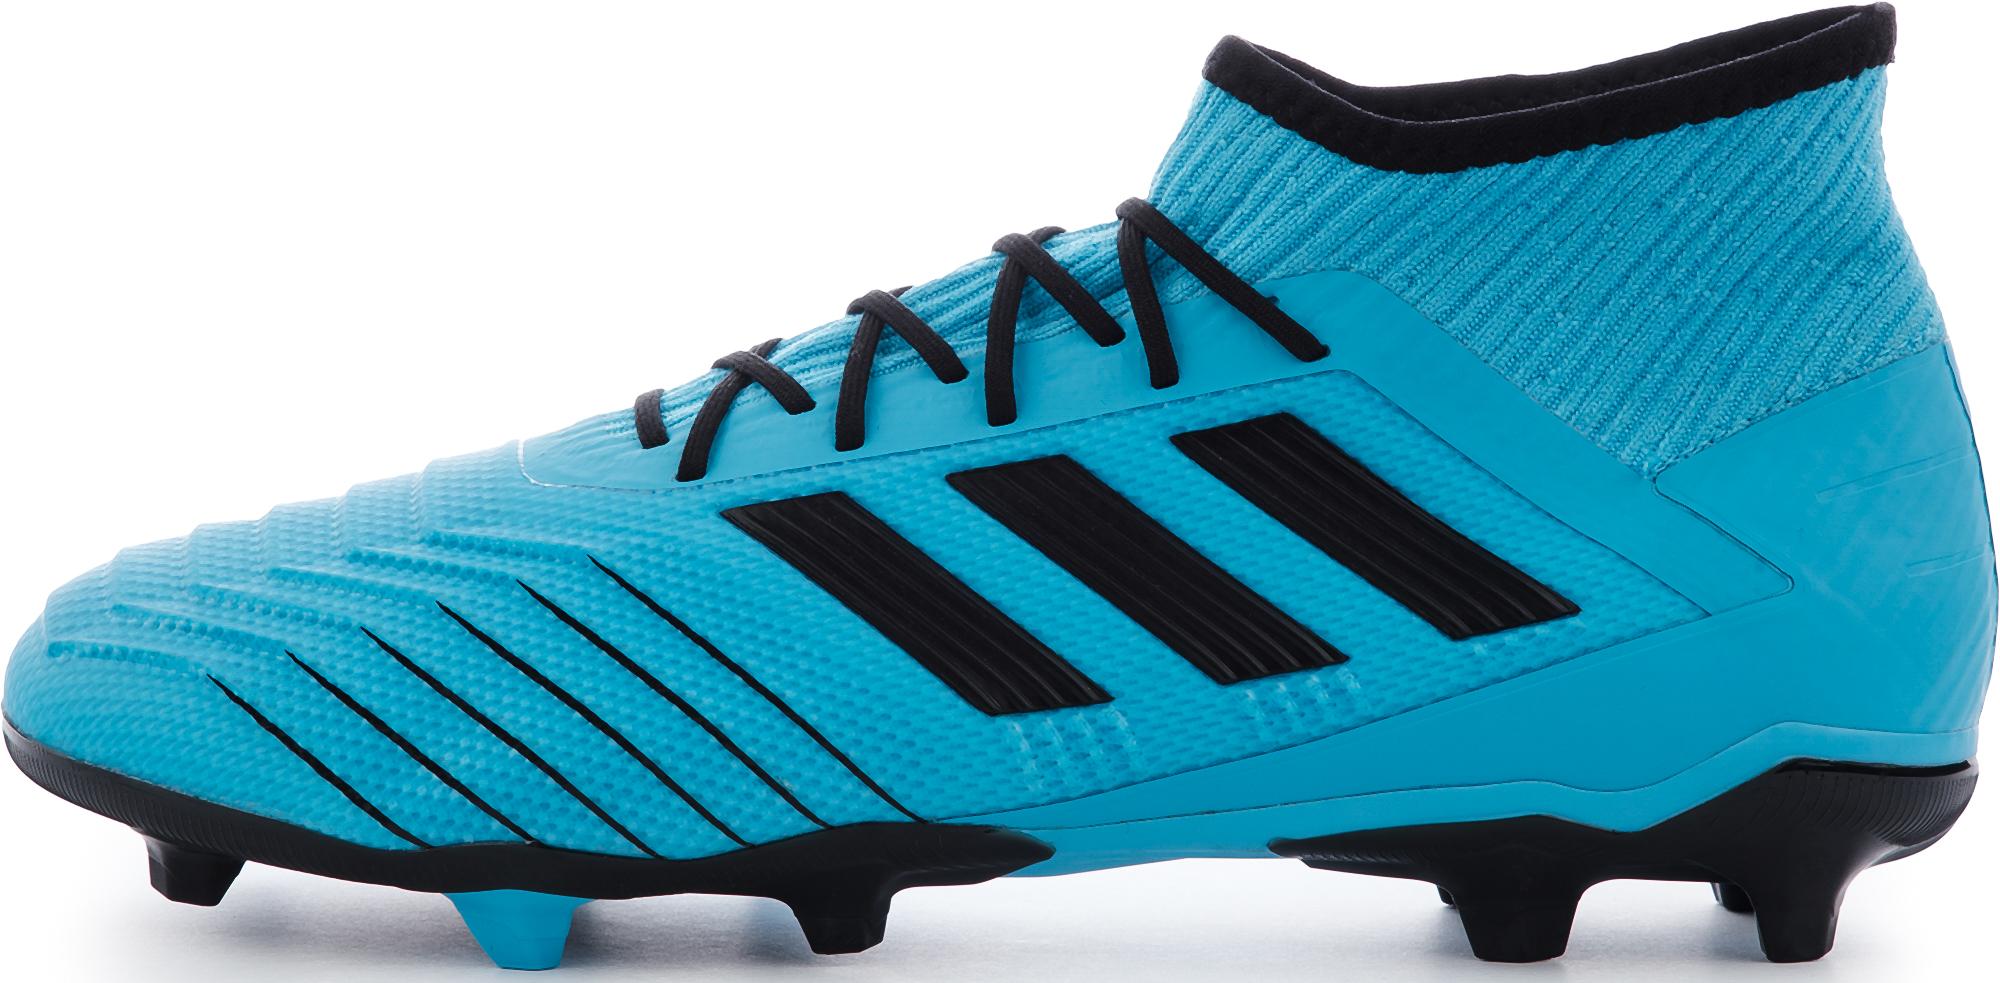 Adidas Бутсы мужские Adidas Predator 19.2 FG, размер 44 бутсы adidas predator 18 3 fg db2001